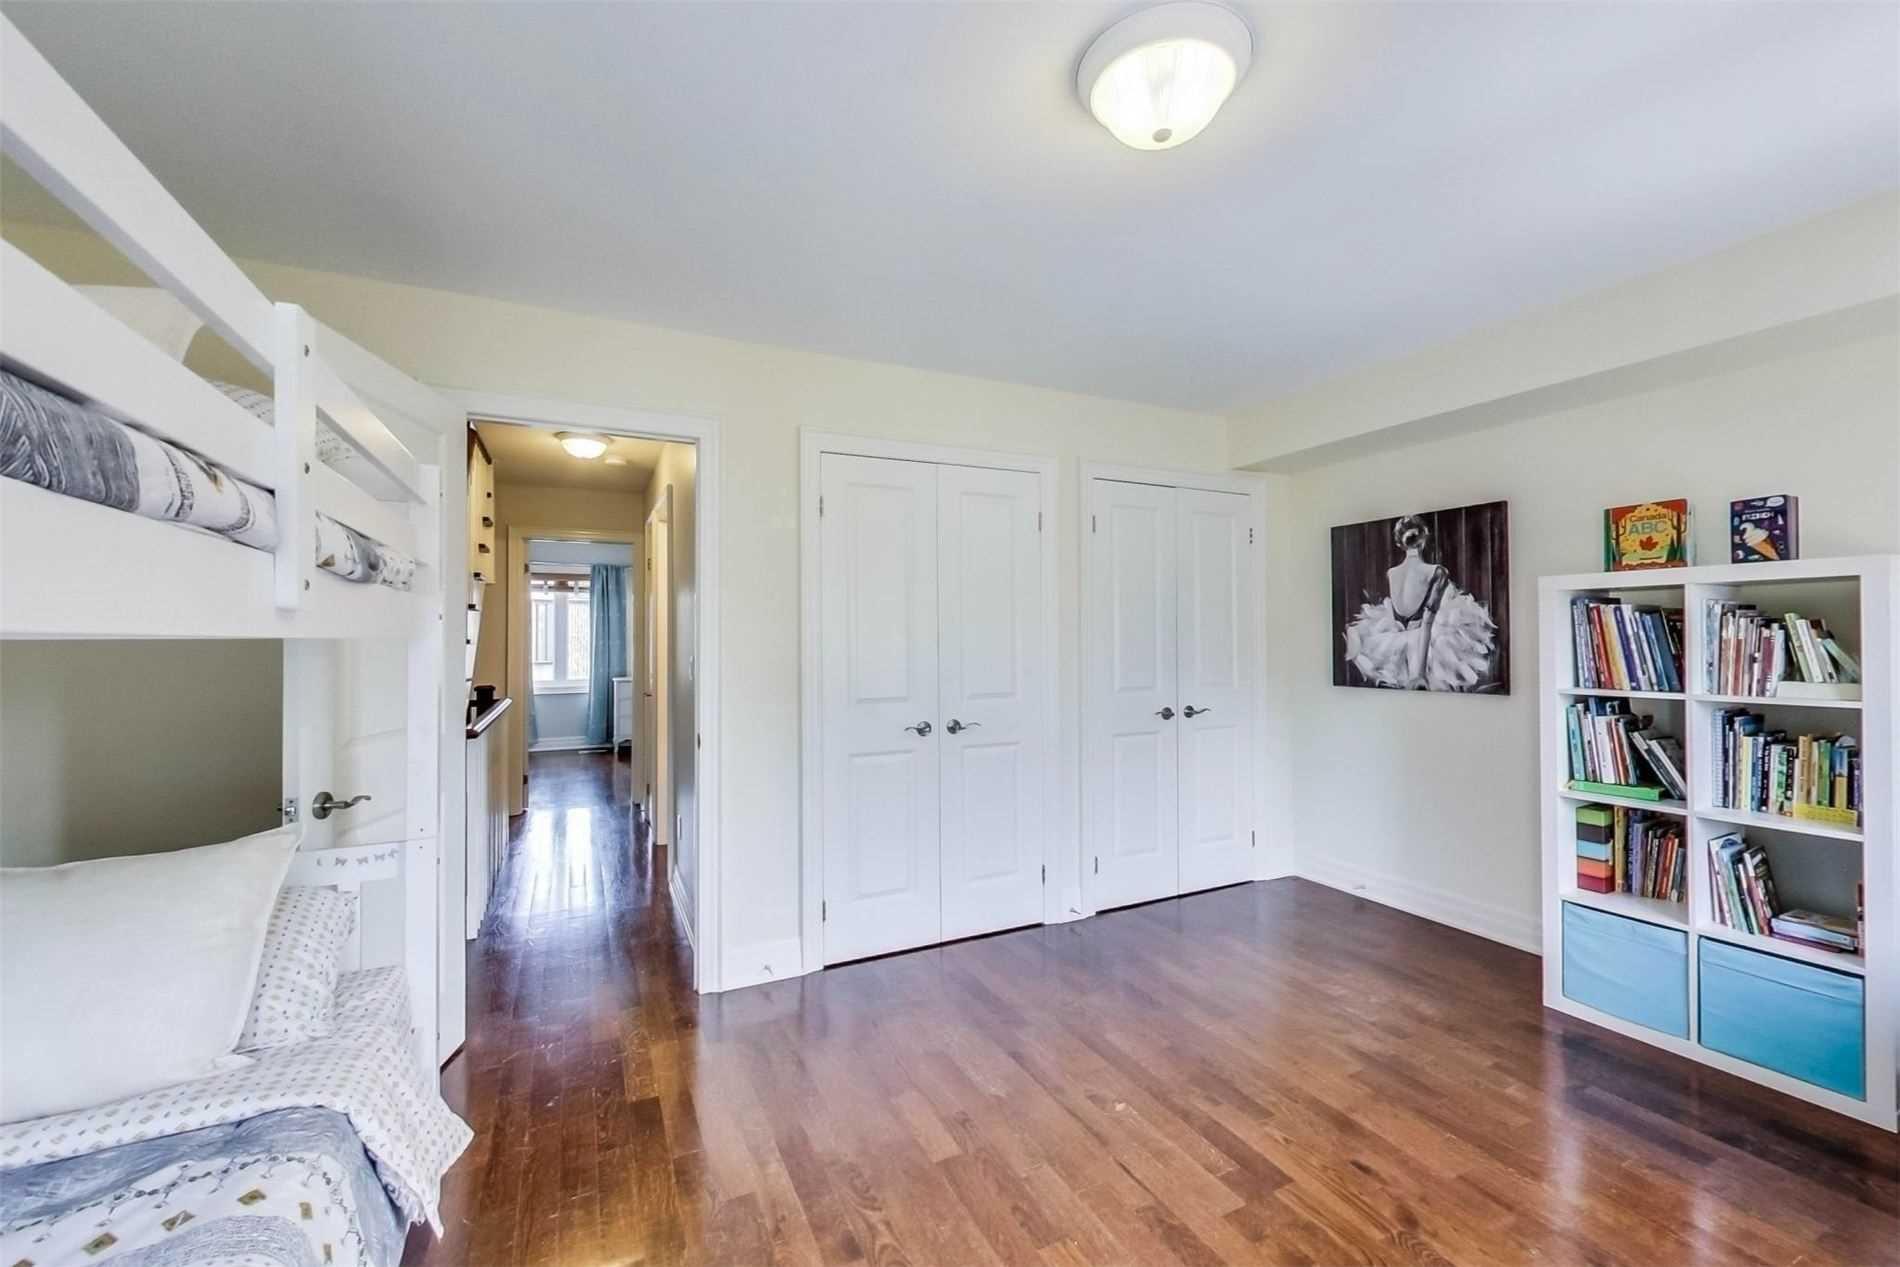 Photo 16: Photos: 213 Heward Avenue in Toronto: South Riverdale House (3-Storey) for sale (Toronto E01)  : MLS®# E4941877